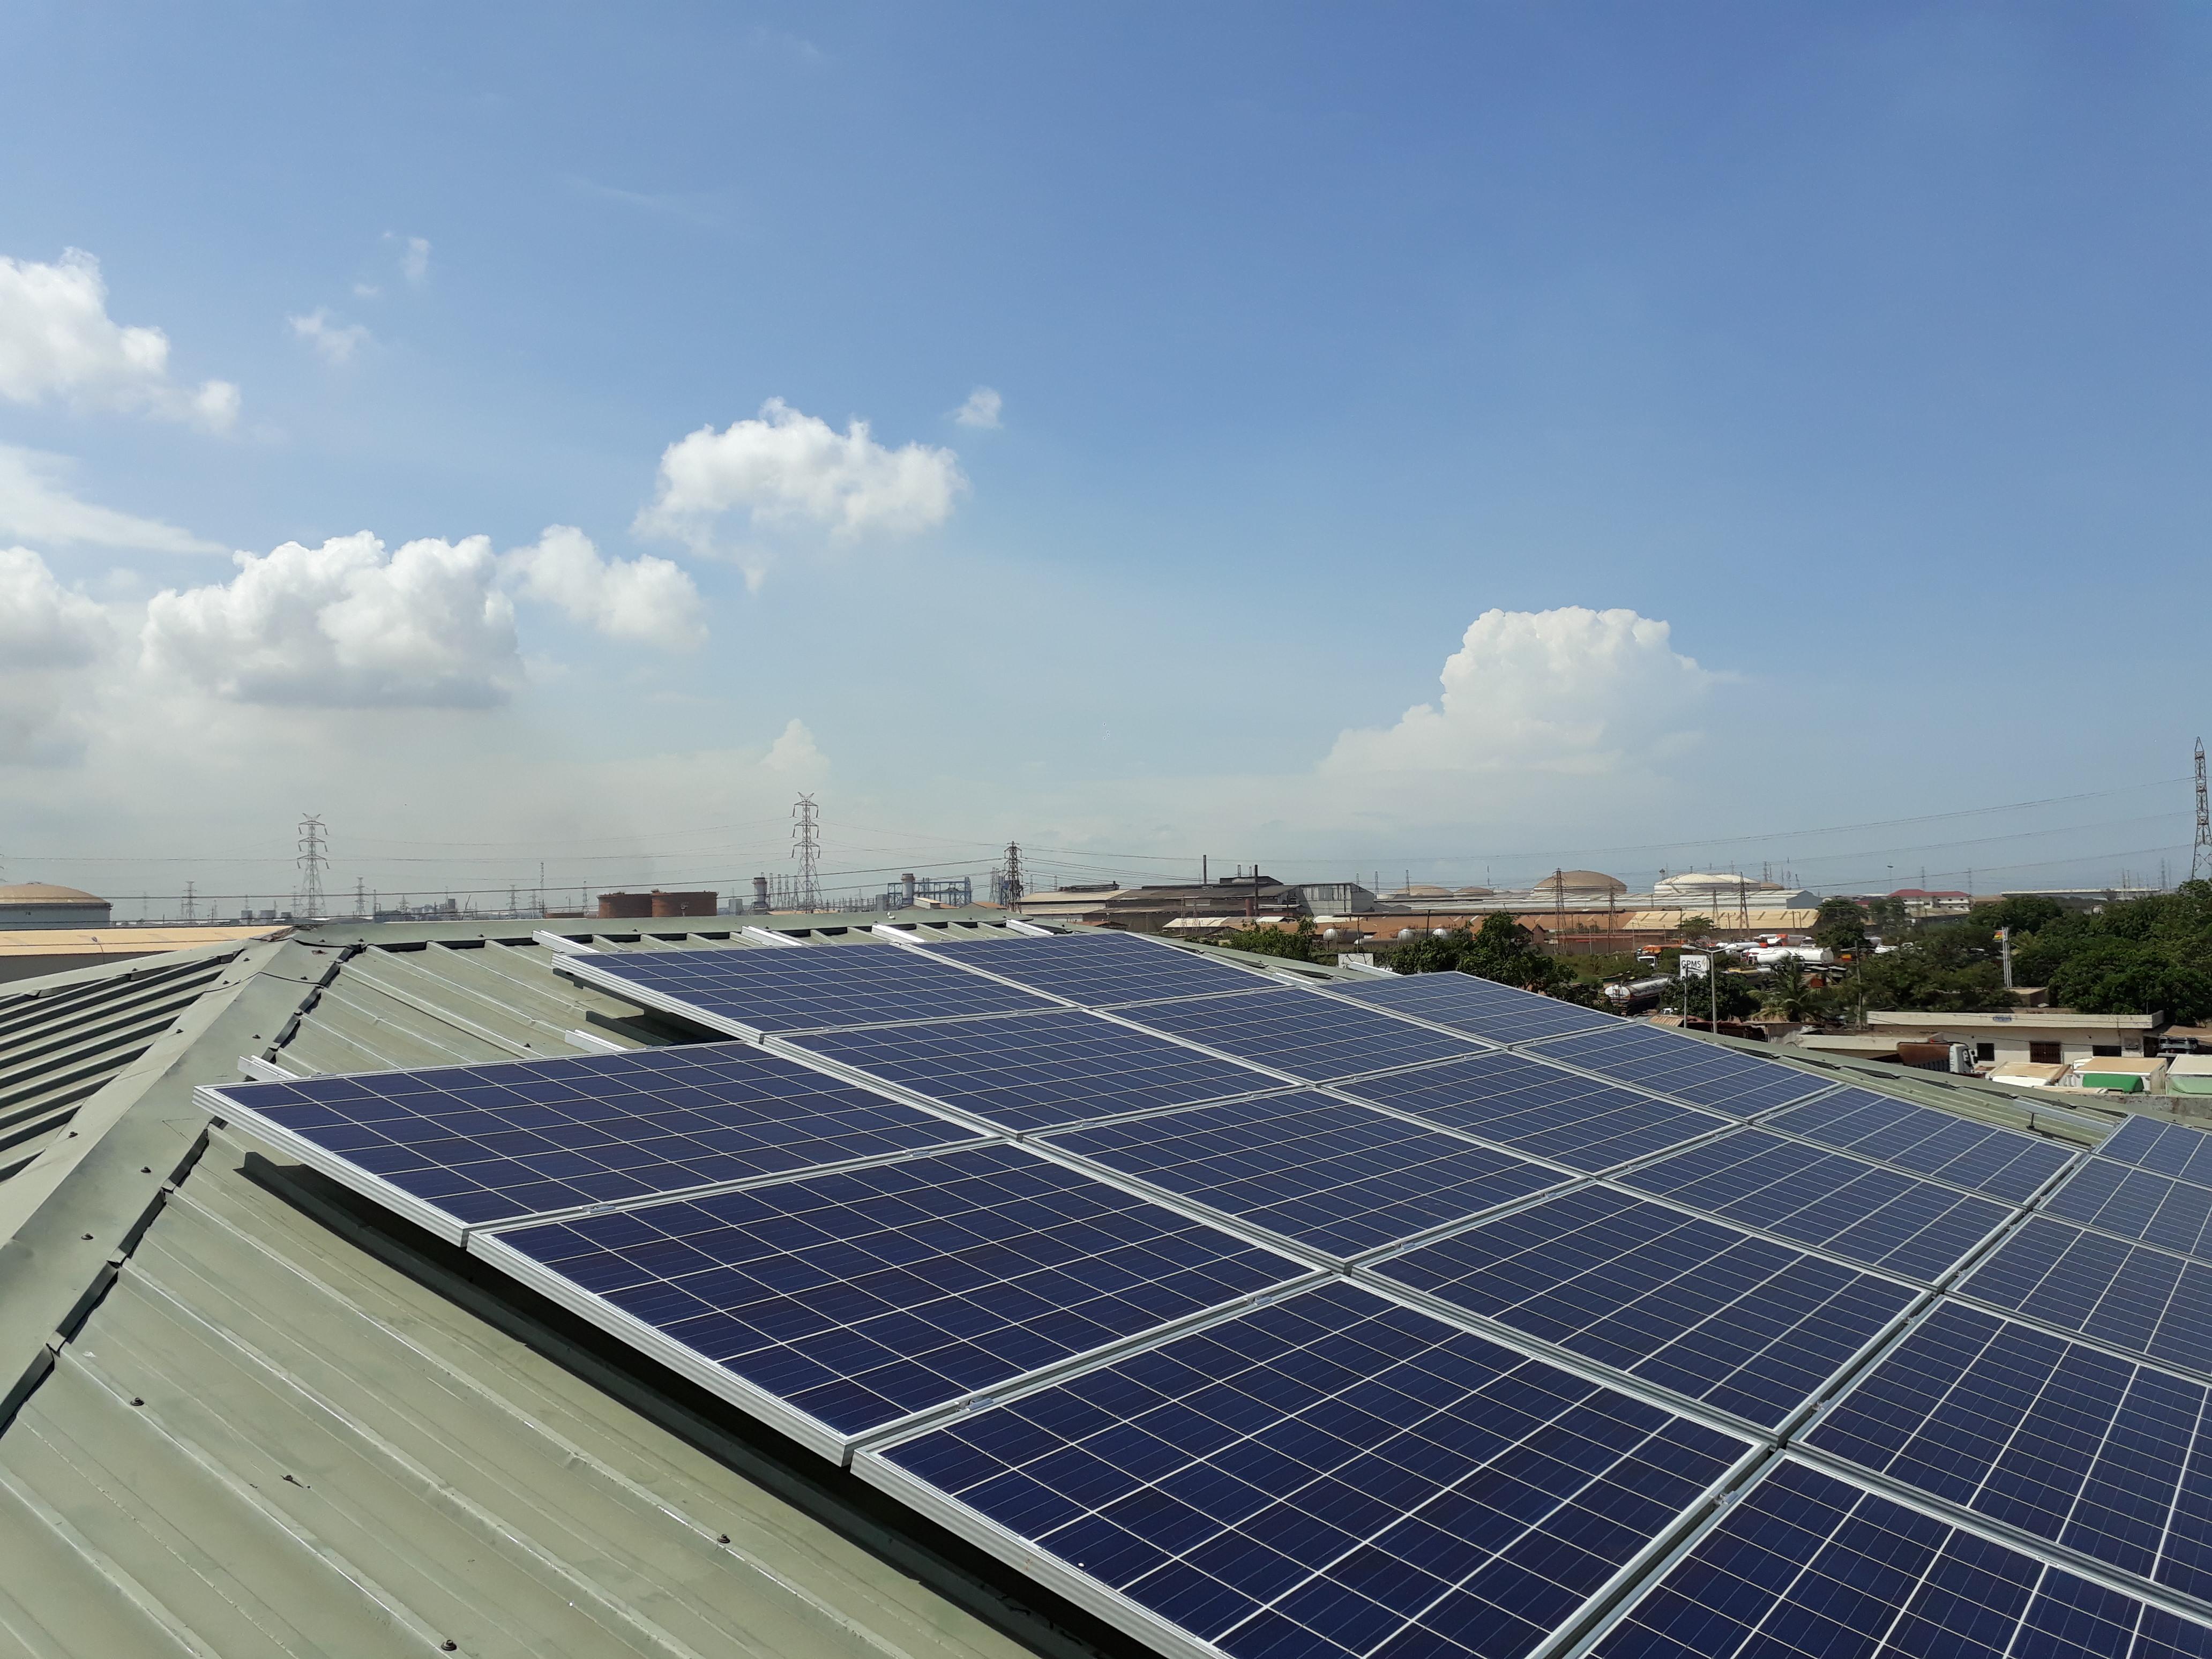 Gallery Affordable Solar Energy 2